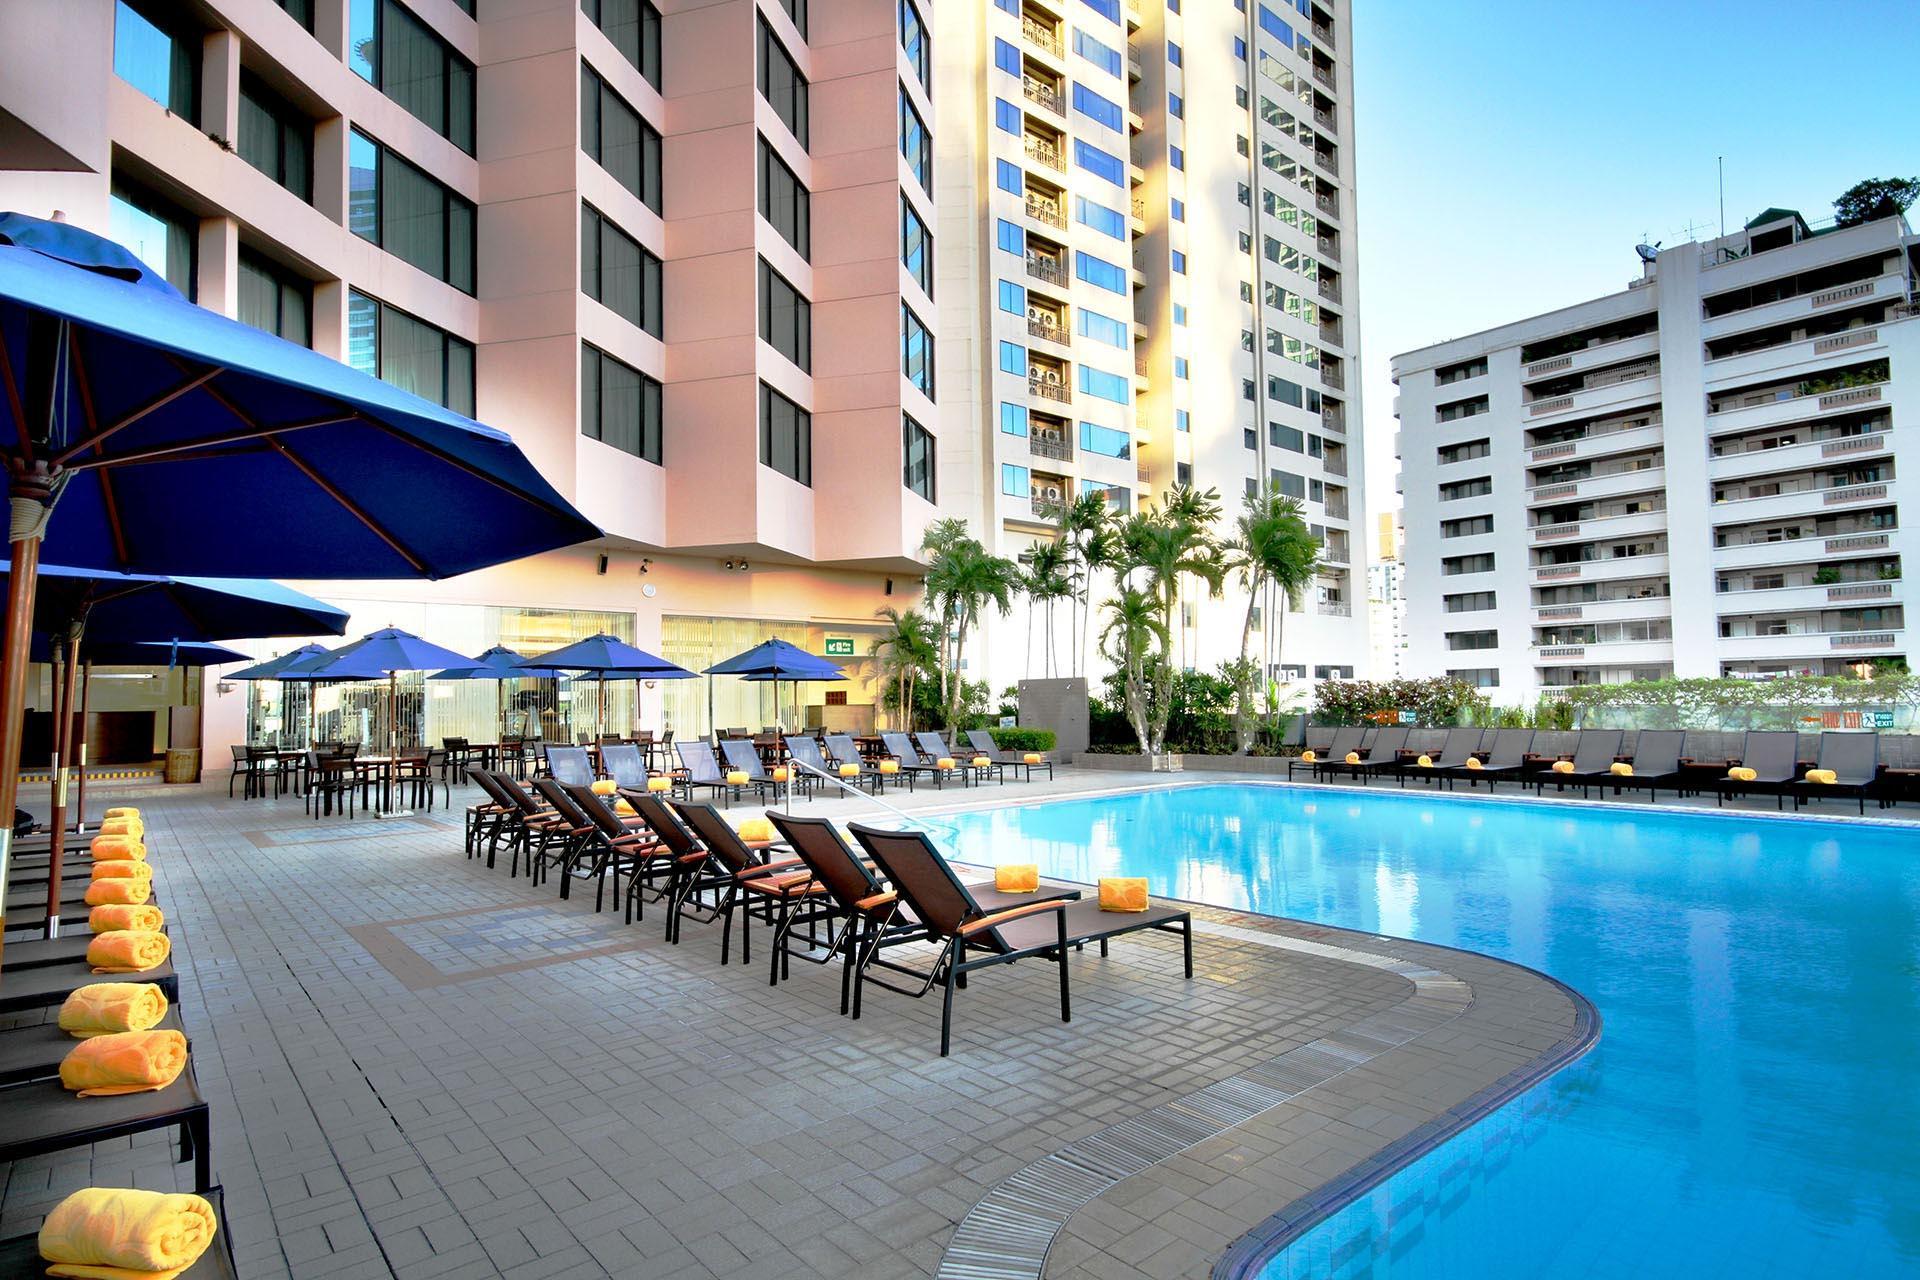 Rembrandt Hotel Bangkok Outdoor Pool